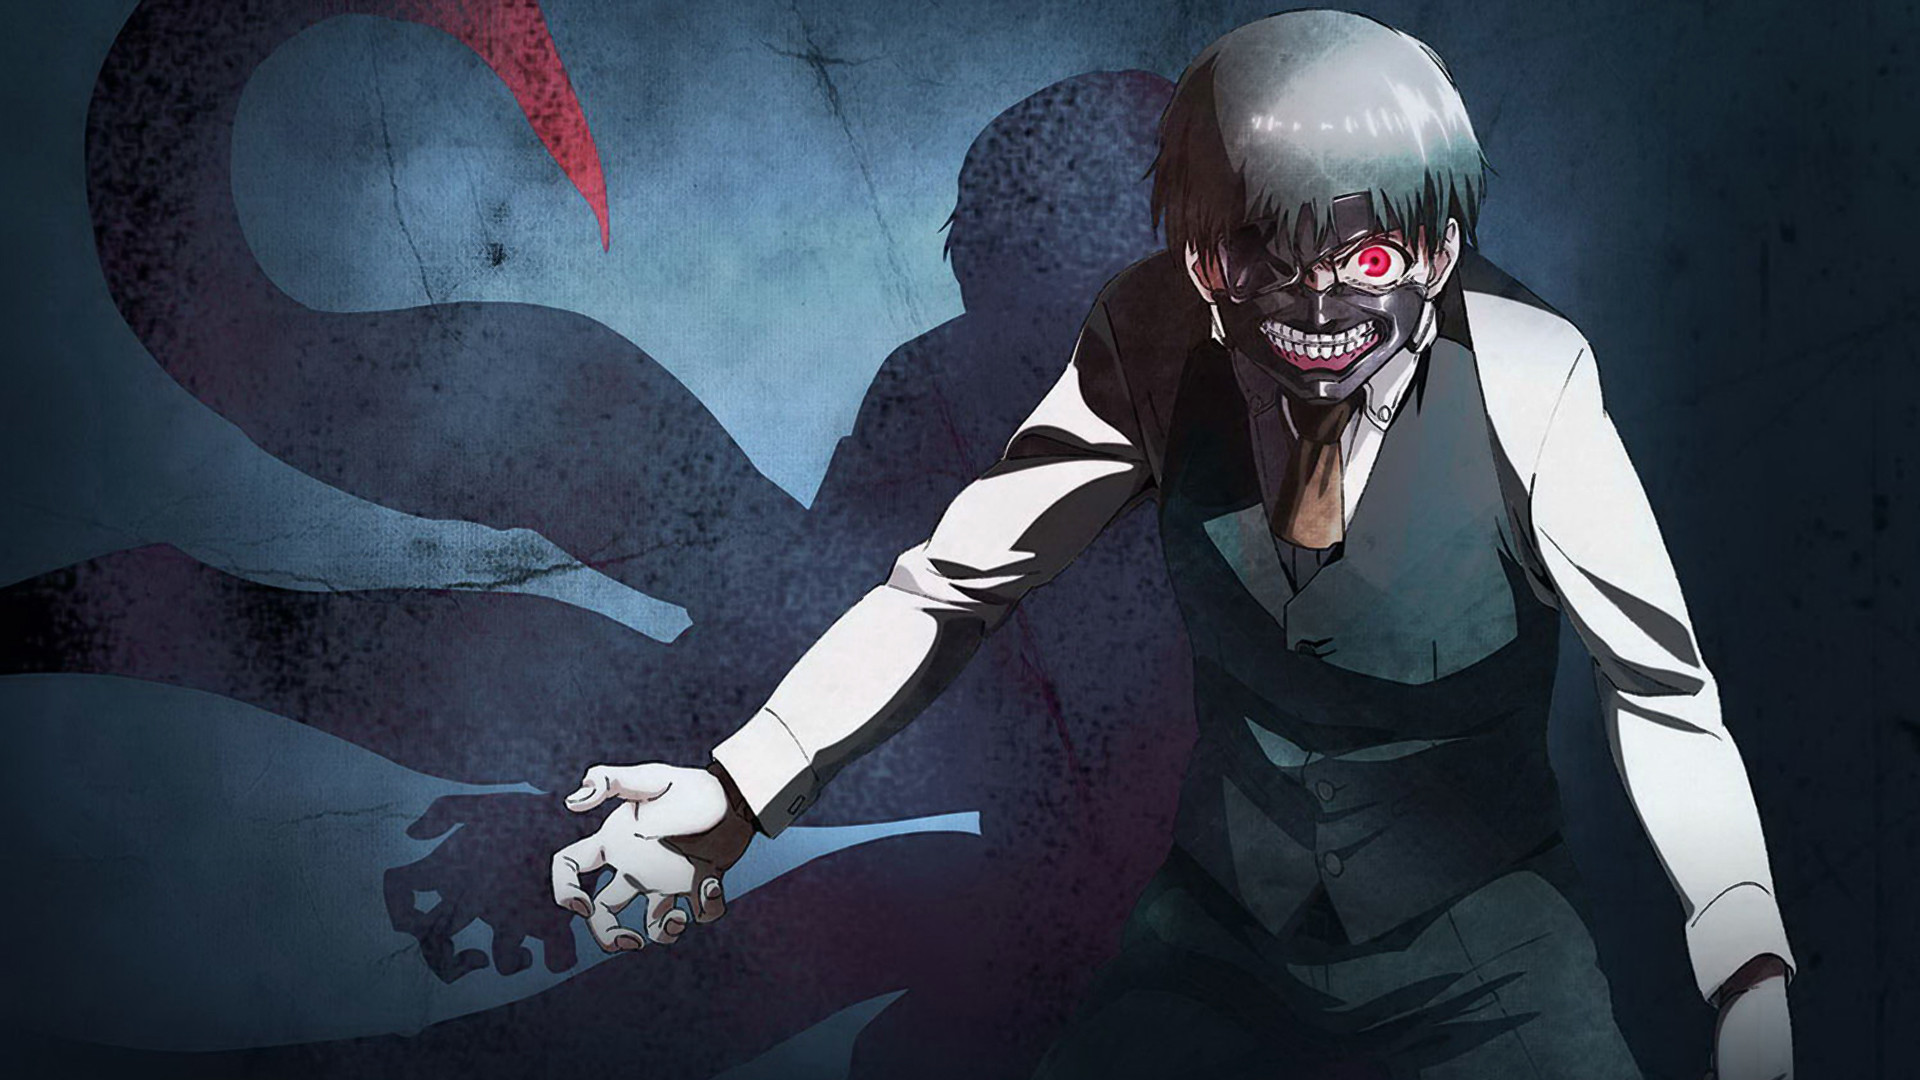 Tokyo Ghoul Anime Ken Mask Wallpaper HD